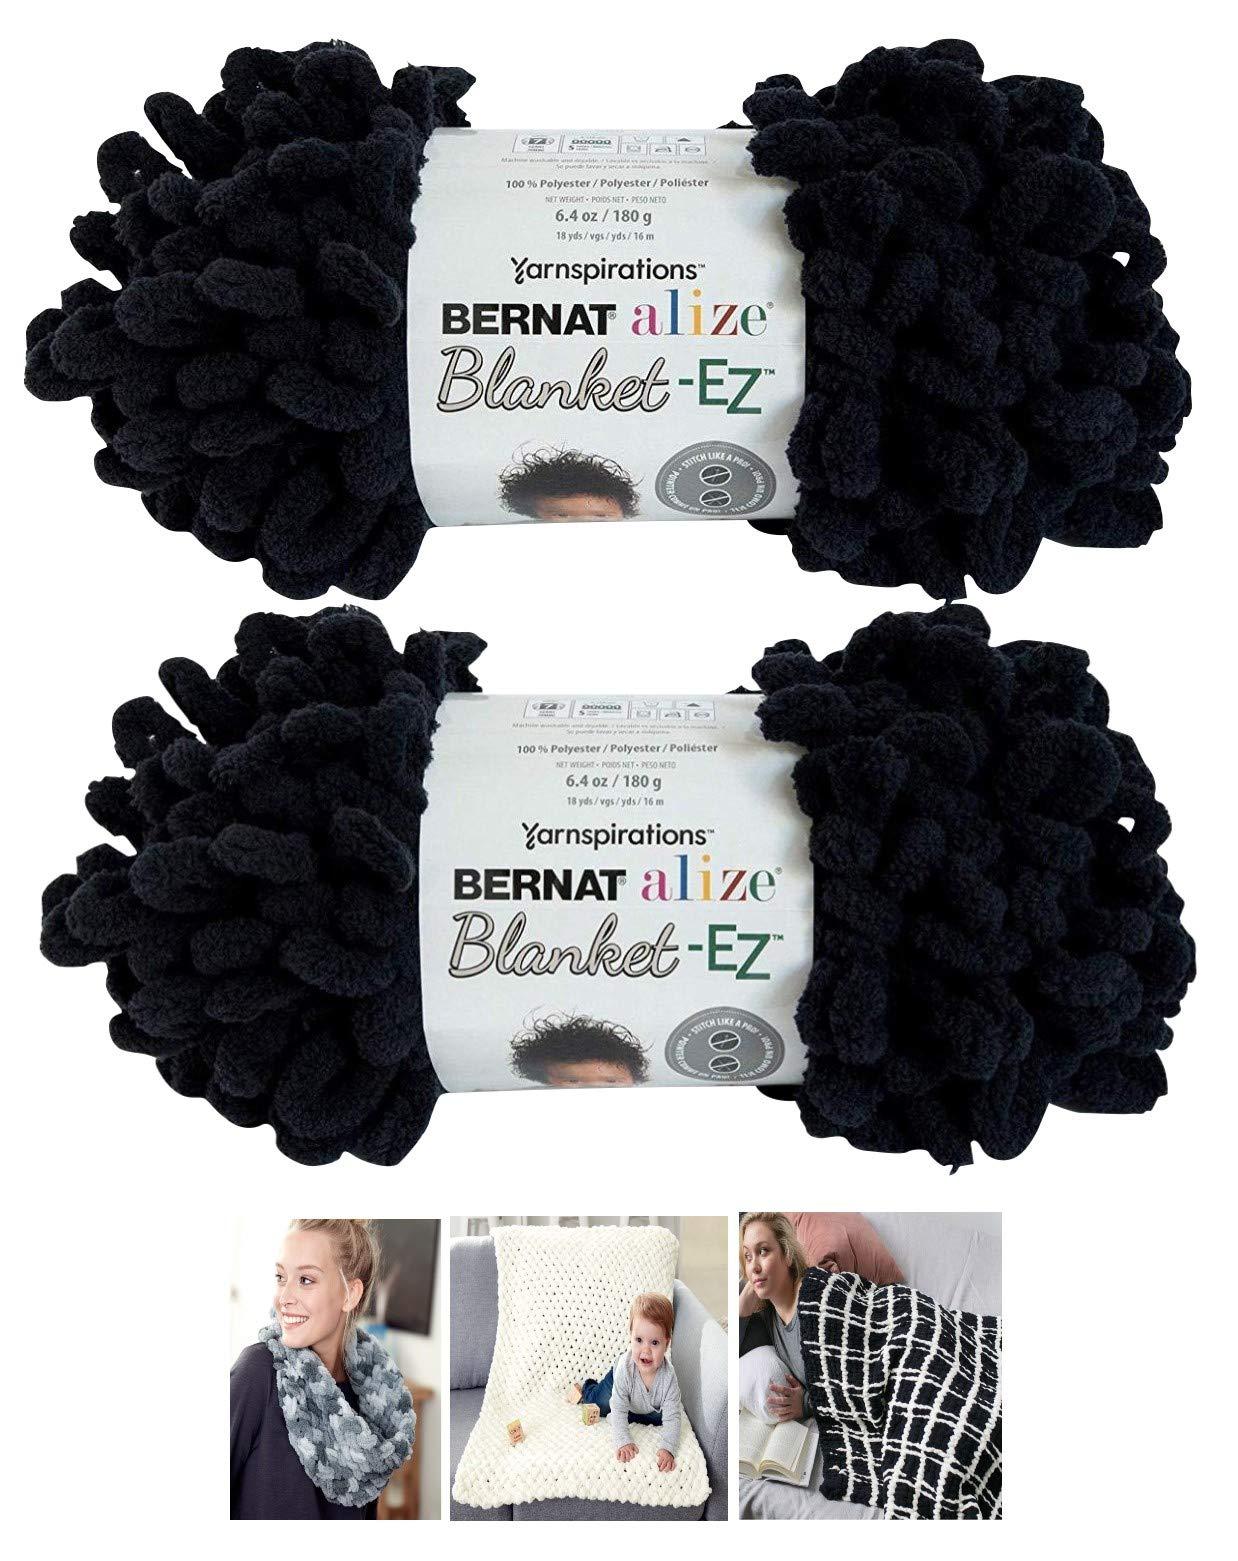 Bernat Alize EZ Blanket Yarn Bundle 100% Polyester 2 -Pack Black Plus 3 Patterns